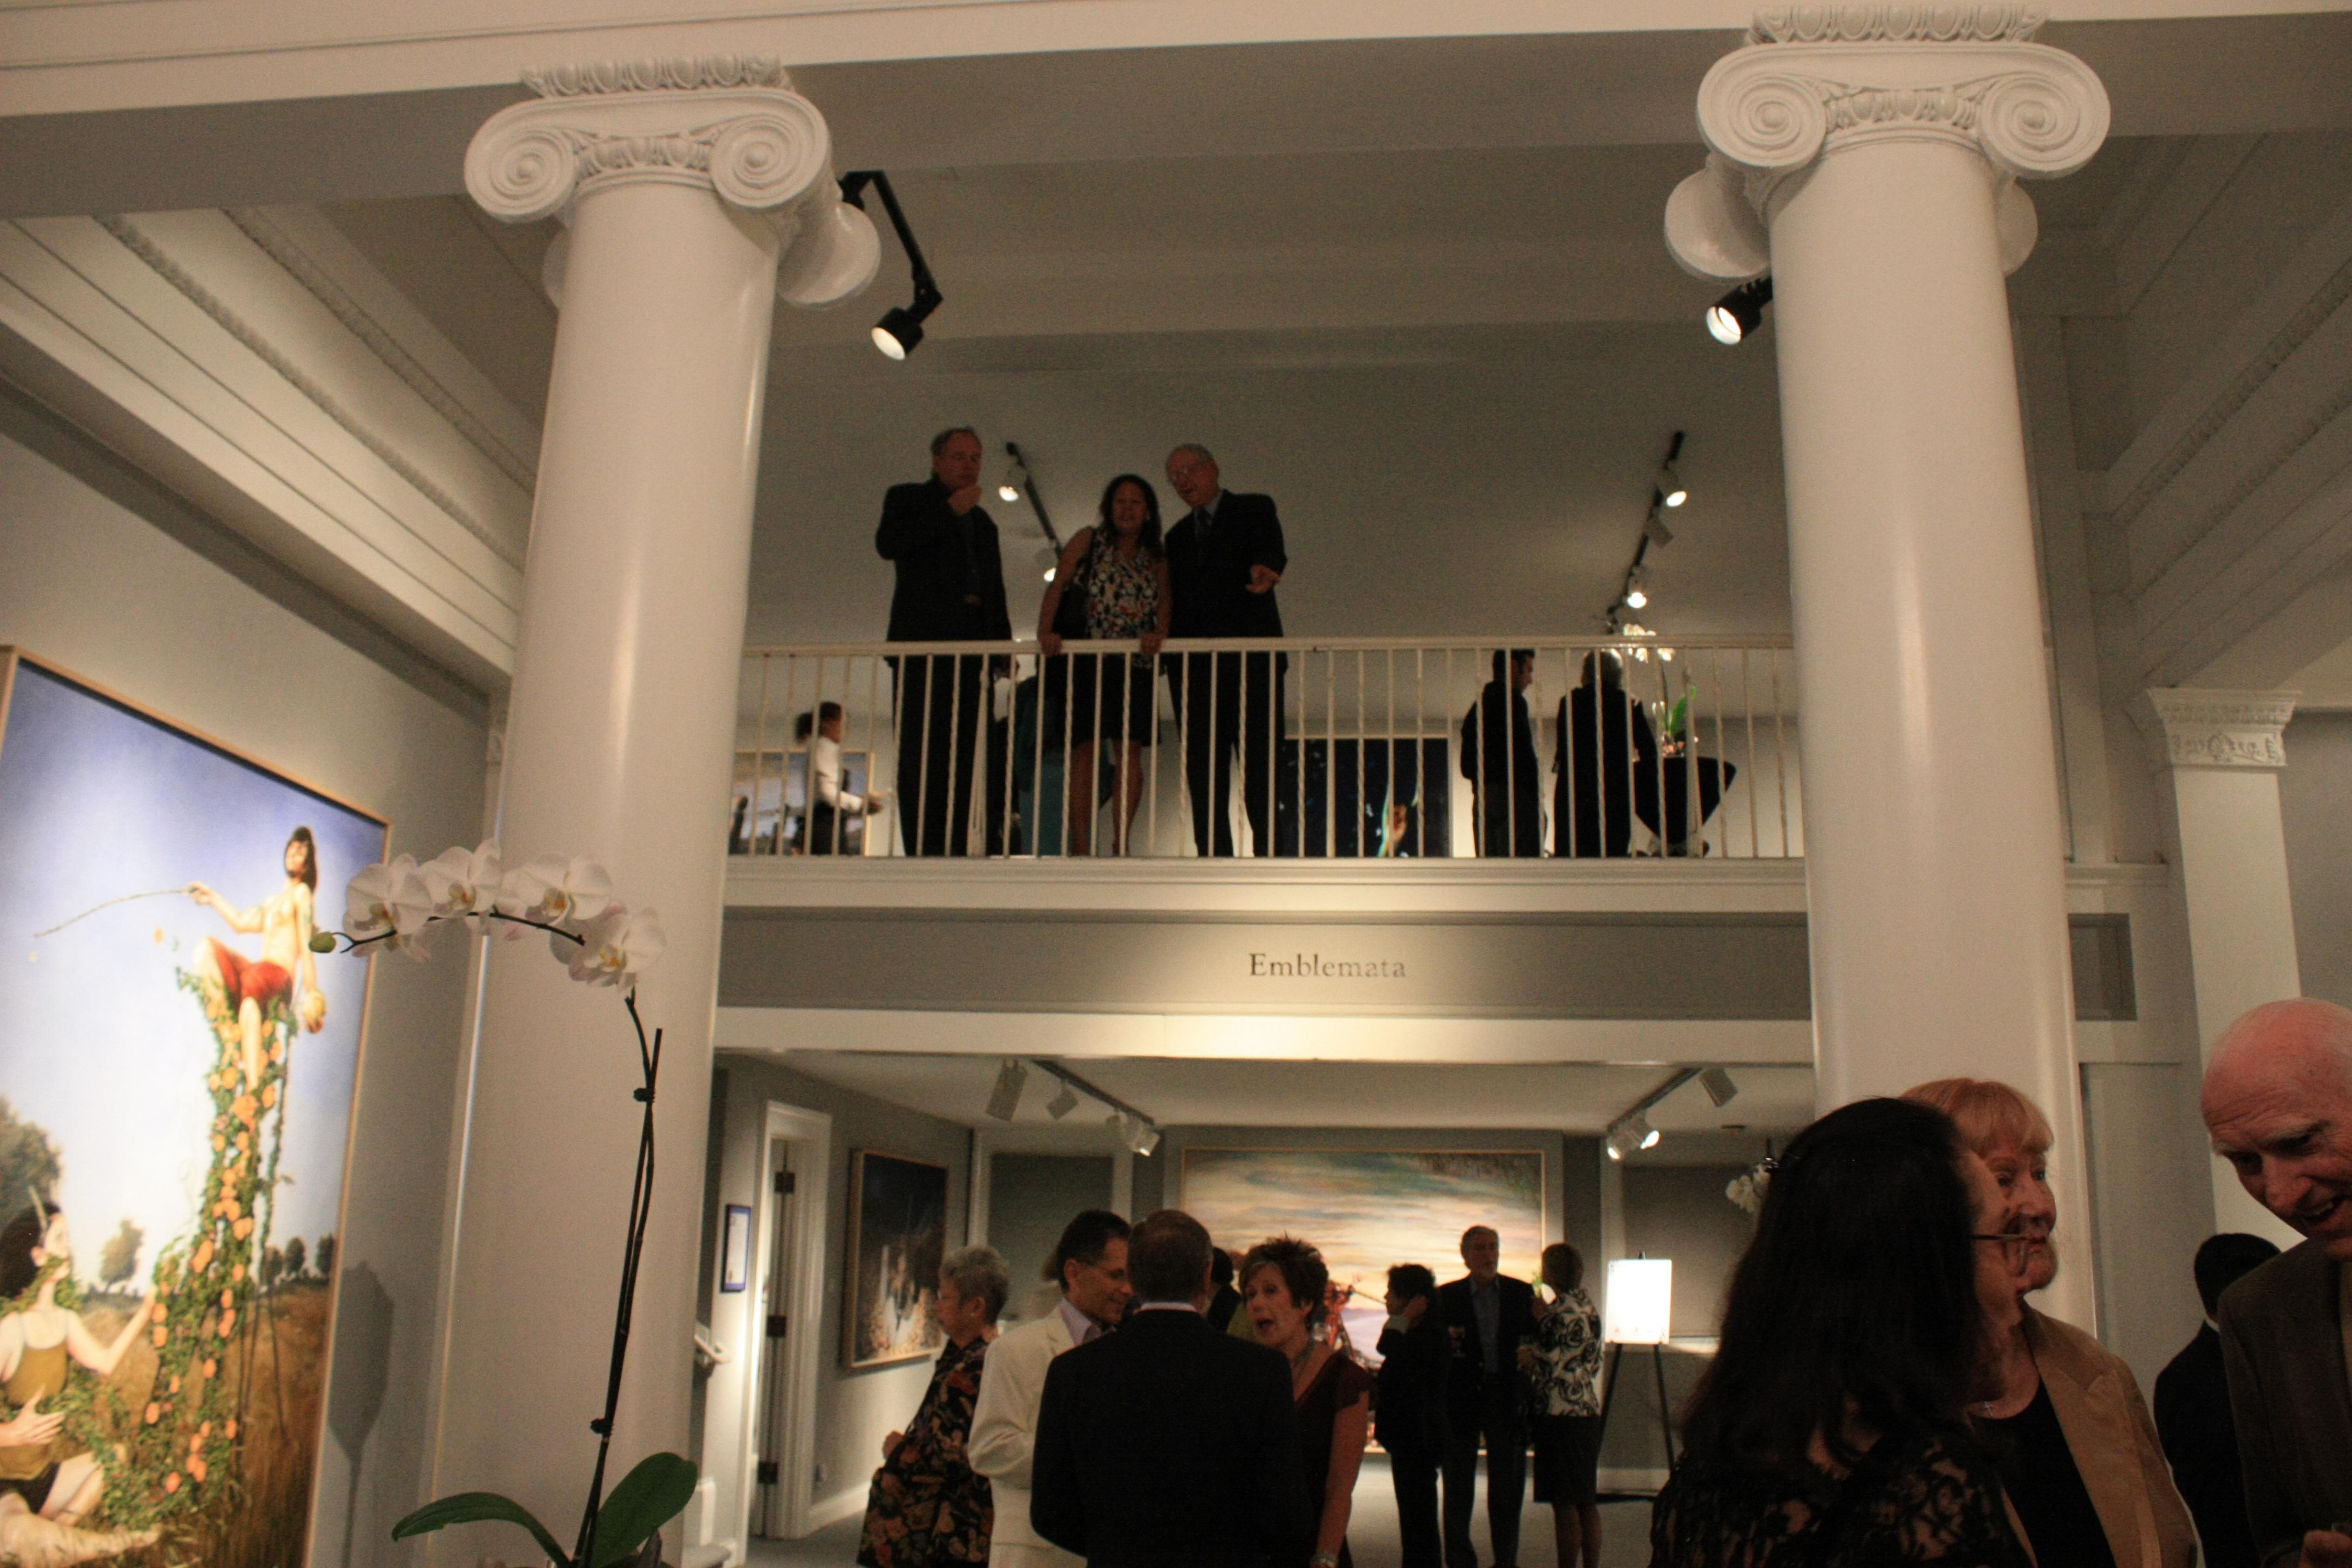 carnegie art museum visitor information visit oxnard